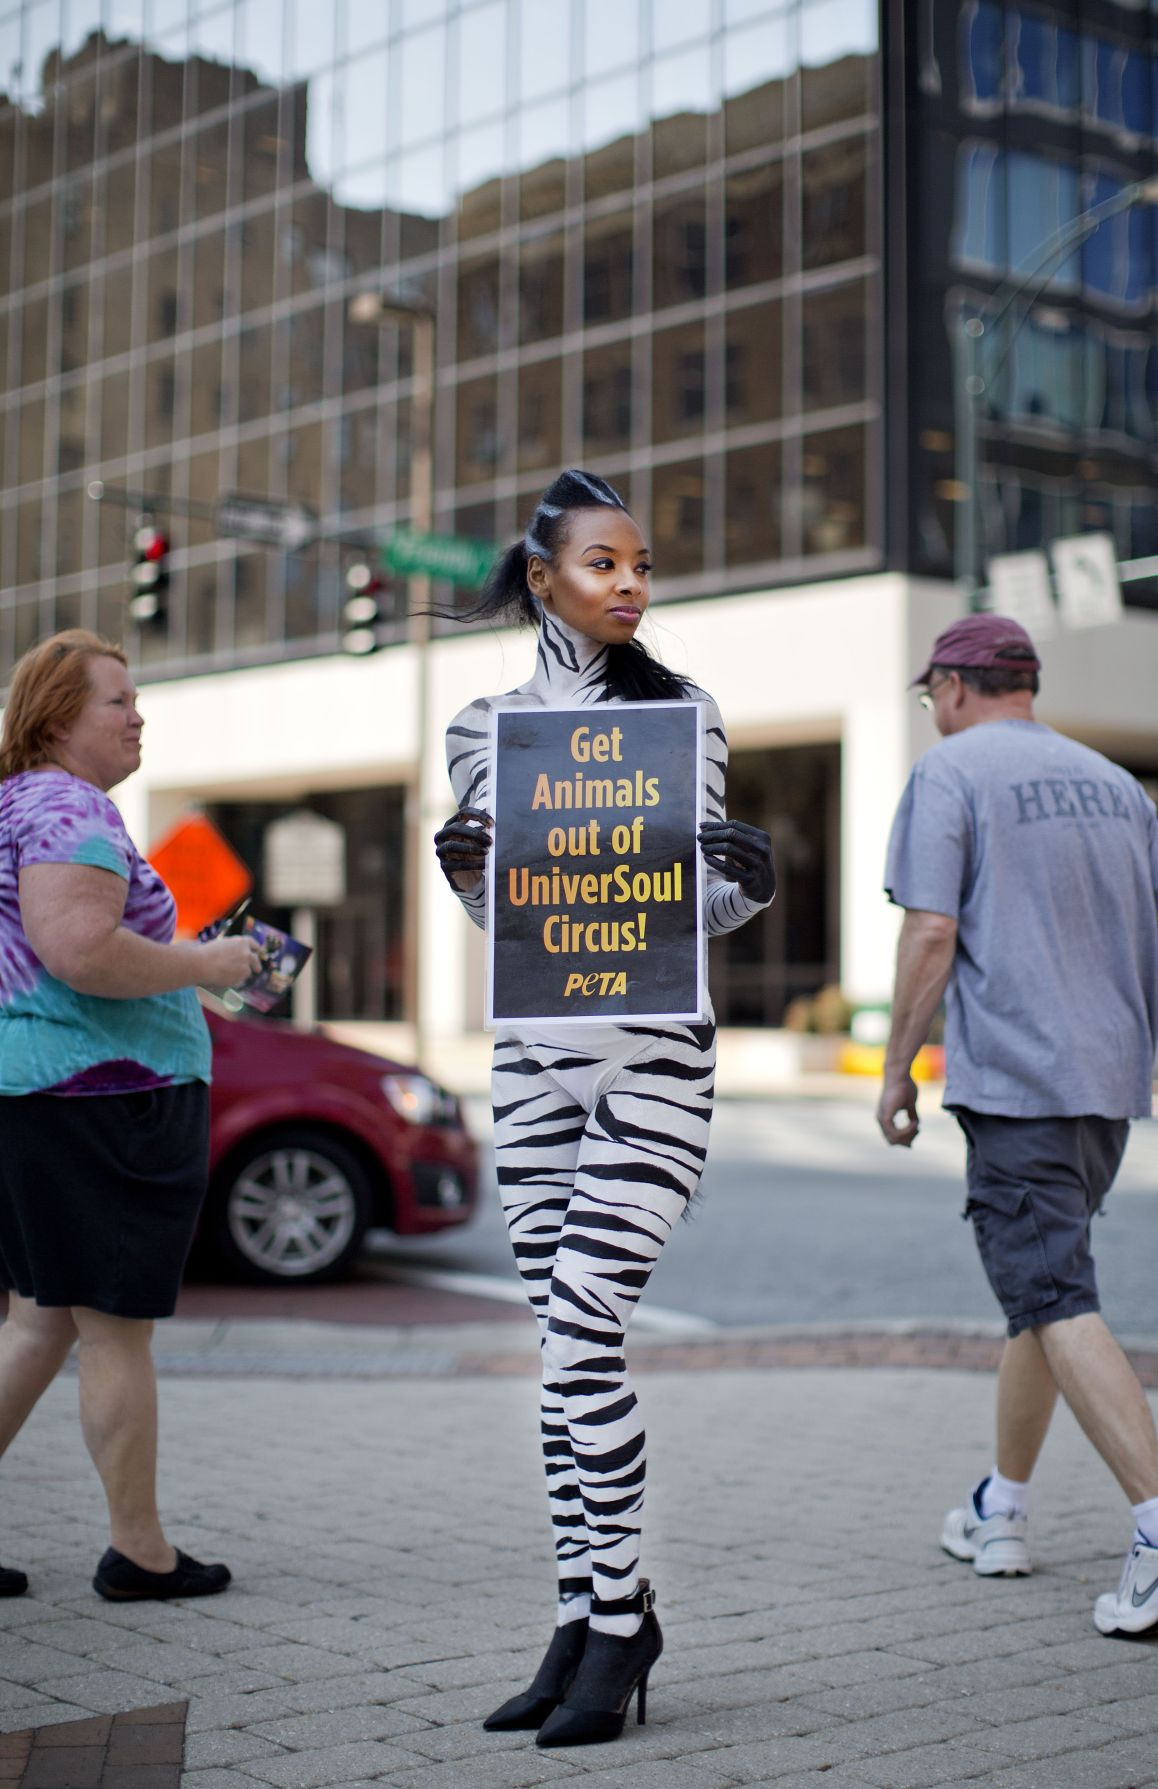 PETA protests the UniverSoul Circus